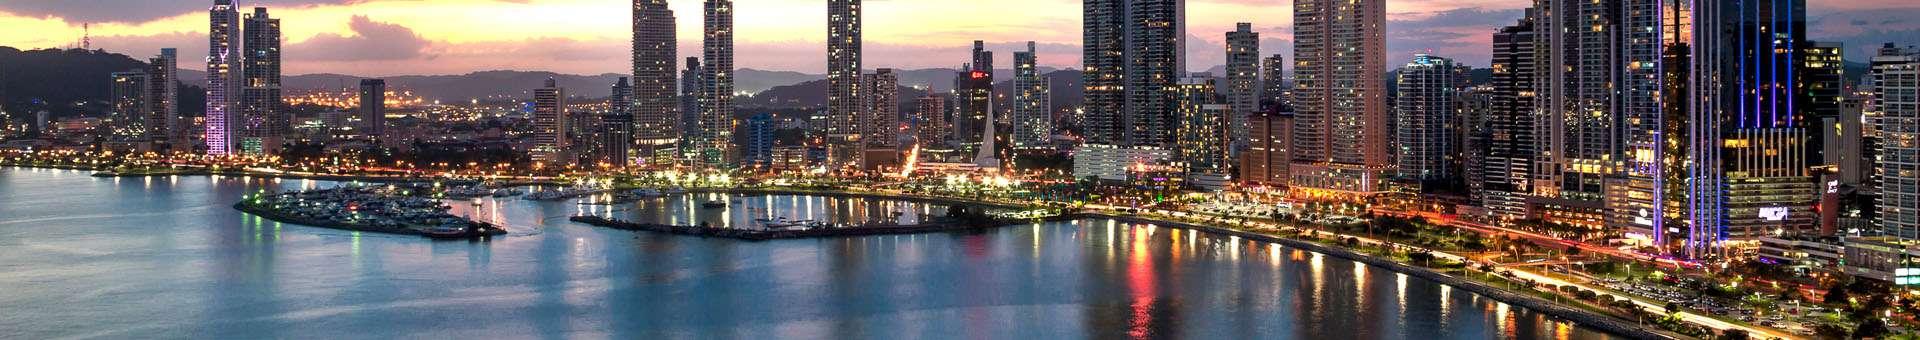 Búsqueda de información Whois de nombres de dominios en Panamá